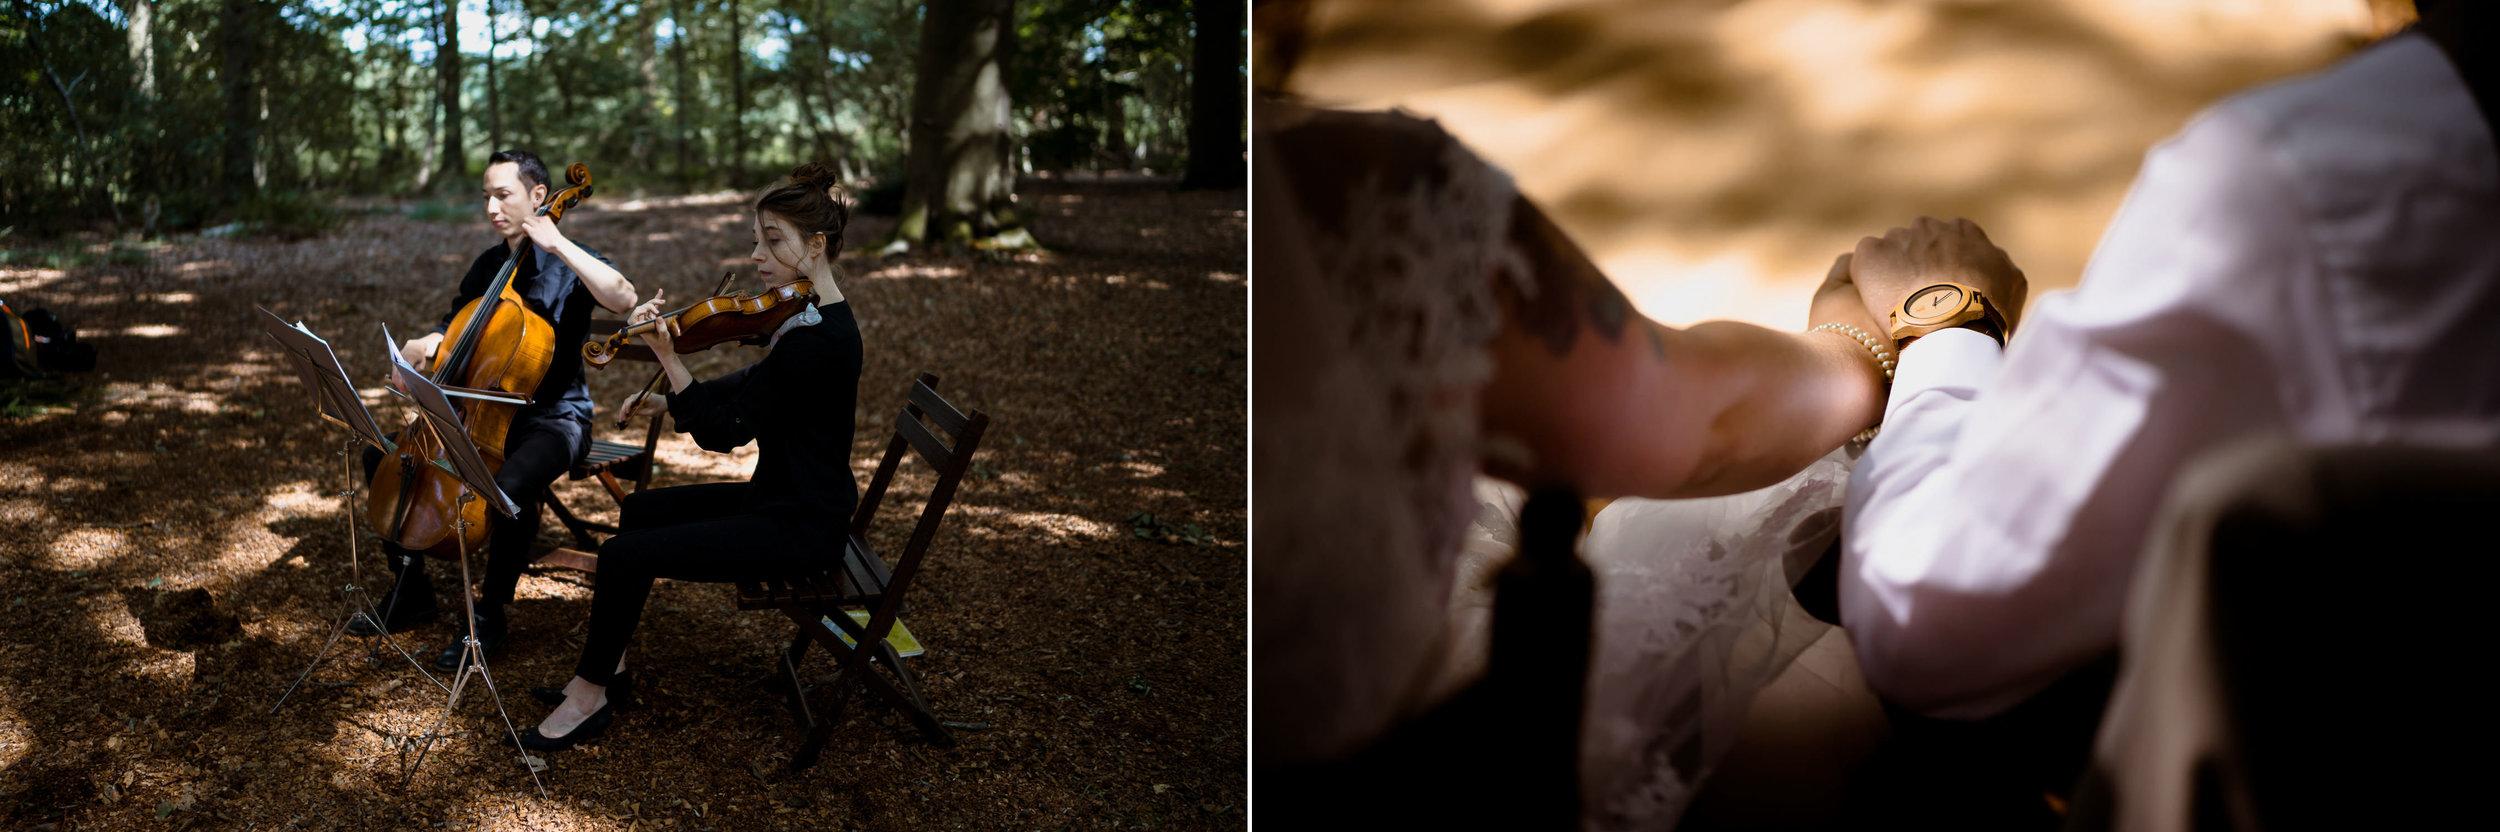 amsterdam-wedding-photographer-bruidsfotografie-trouwfotograaf-mark-hadden-Lucie-Luuk-124 copy.jpg